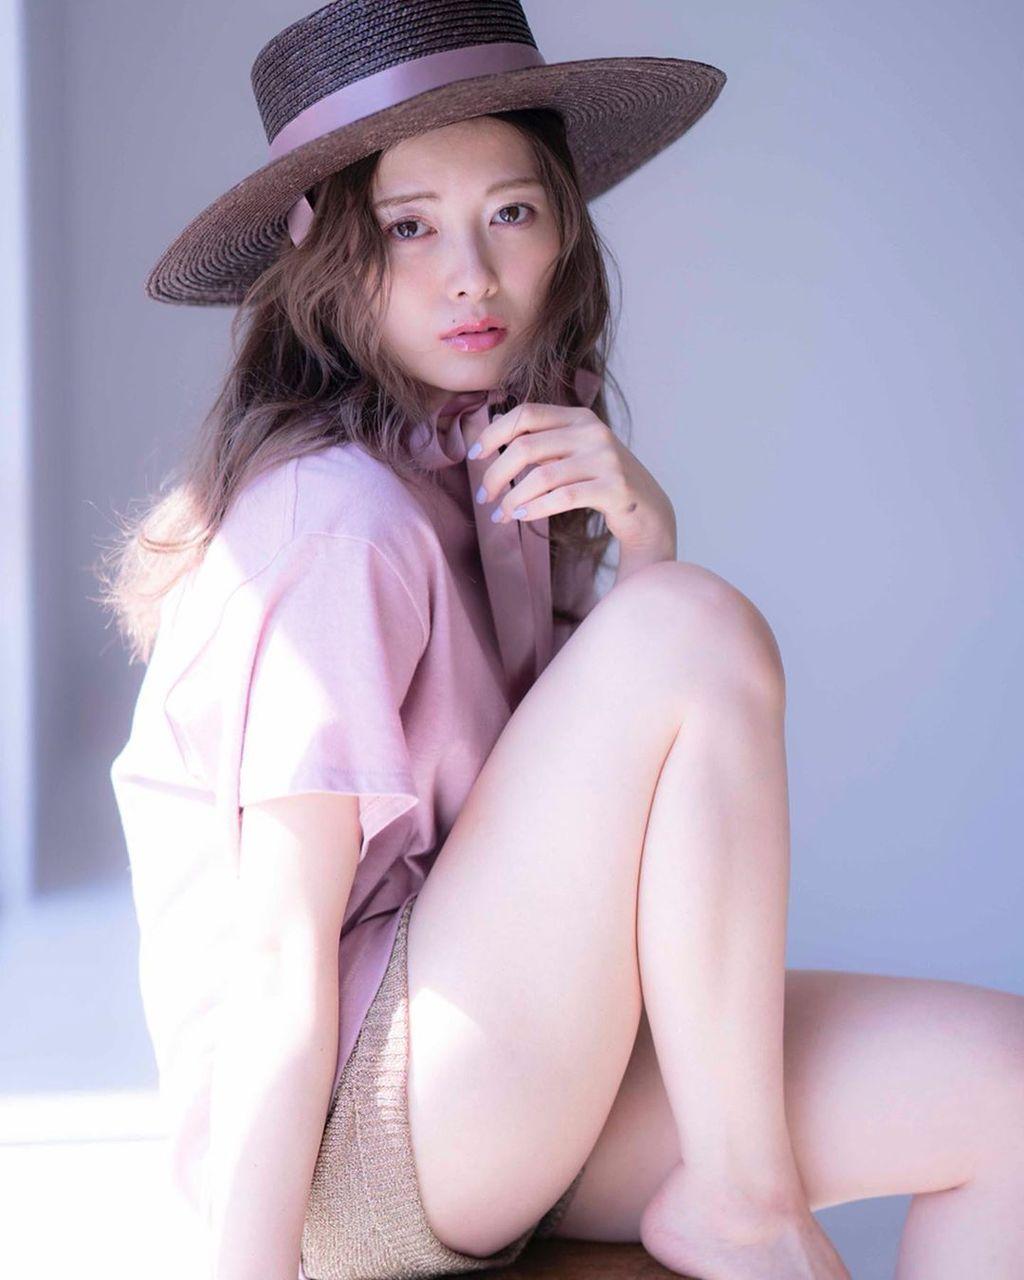 白石麻衣エロ画像tumblr_prhl94wnVE1w3ota5o2_1280